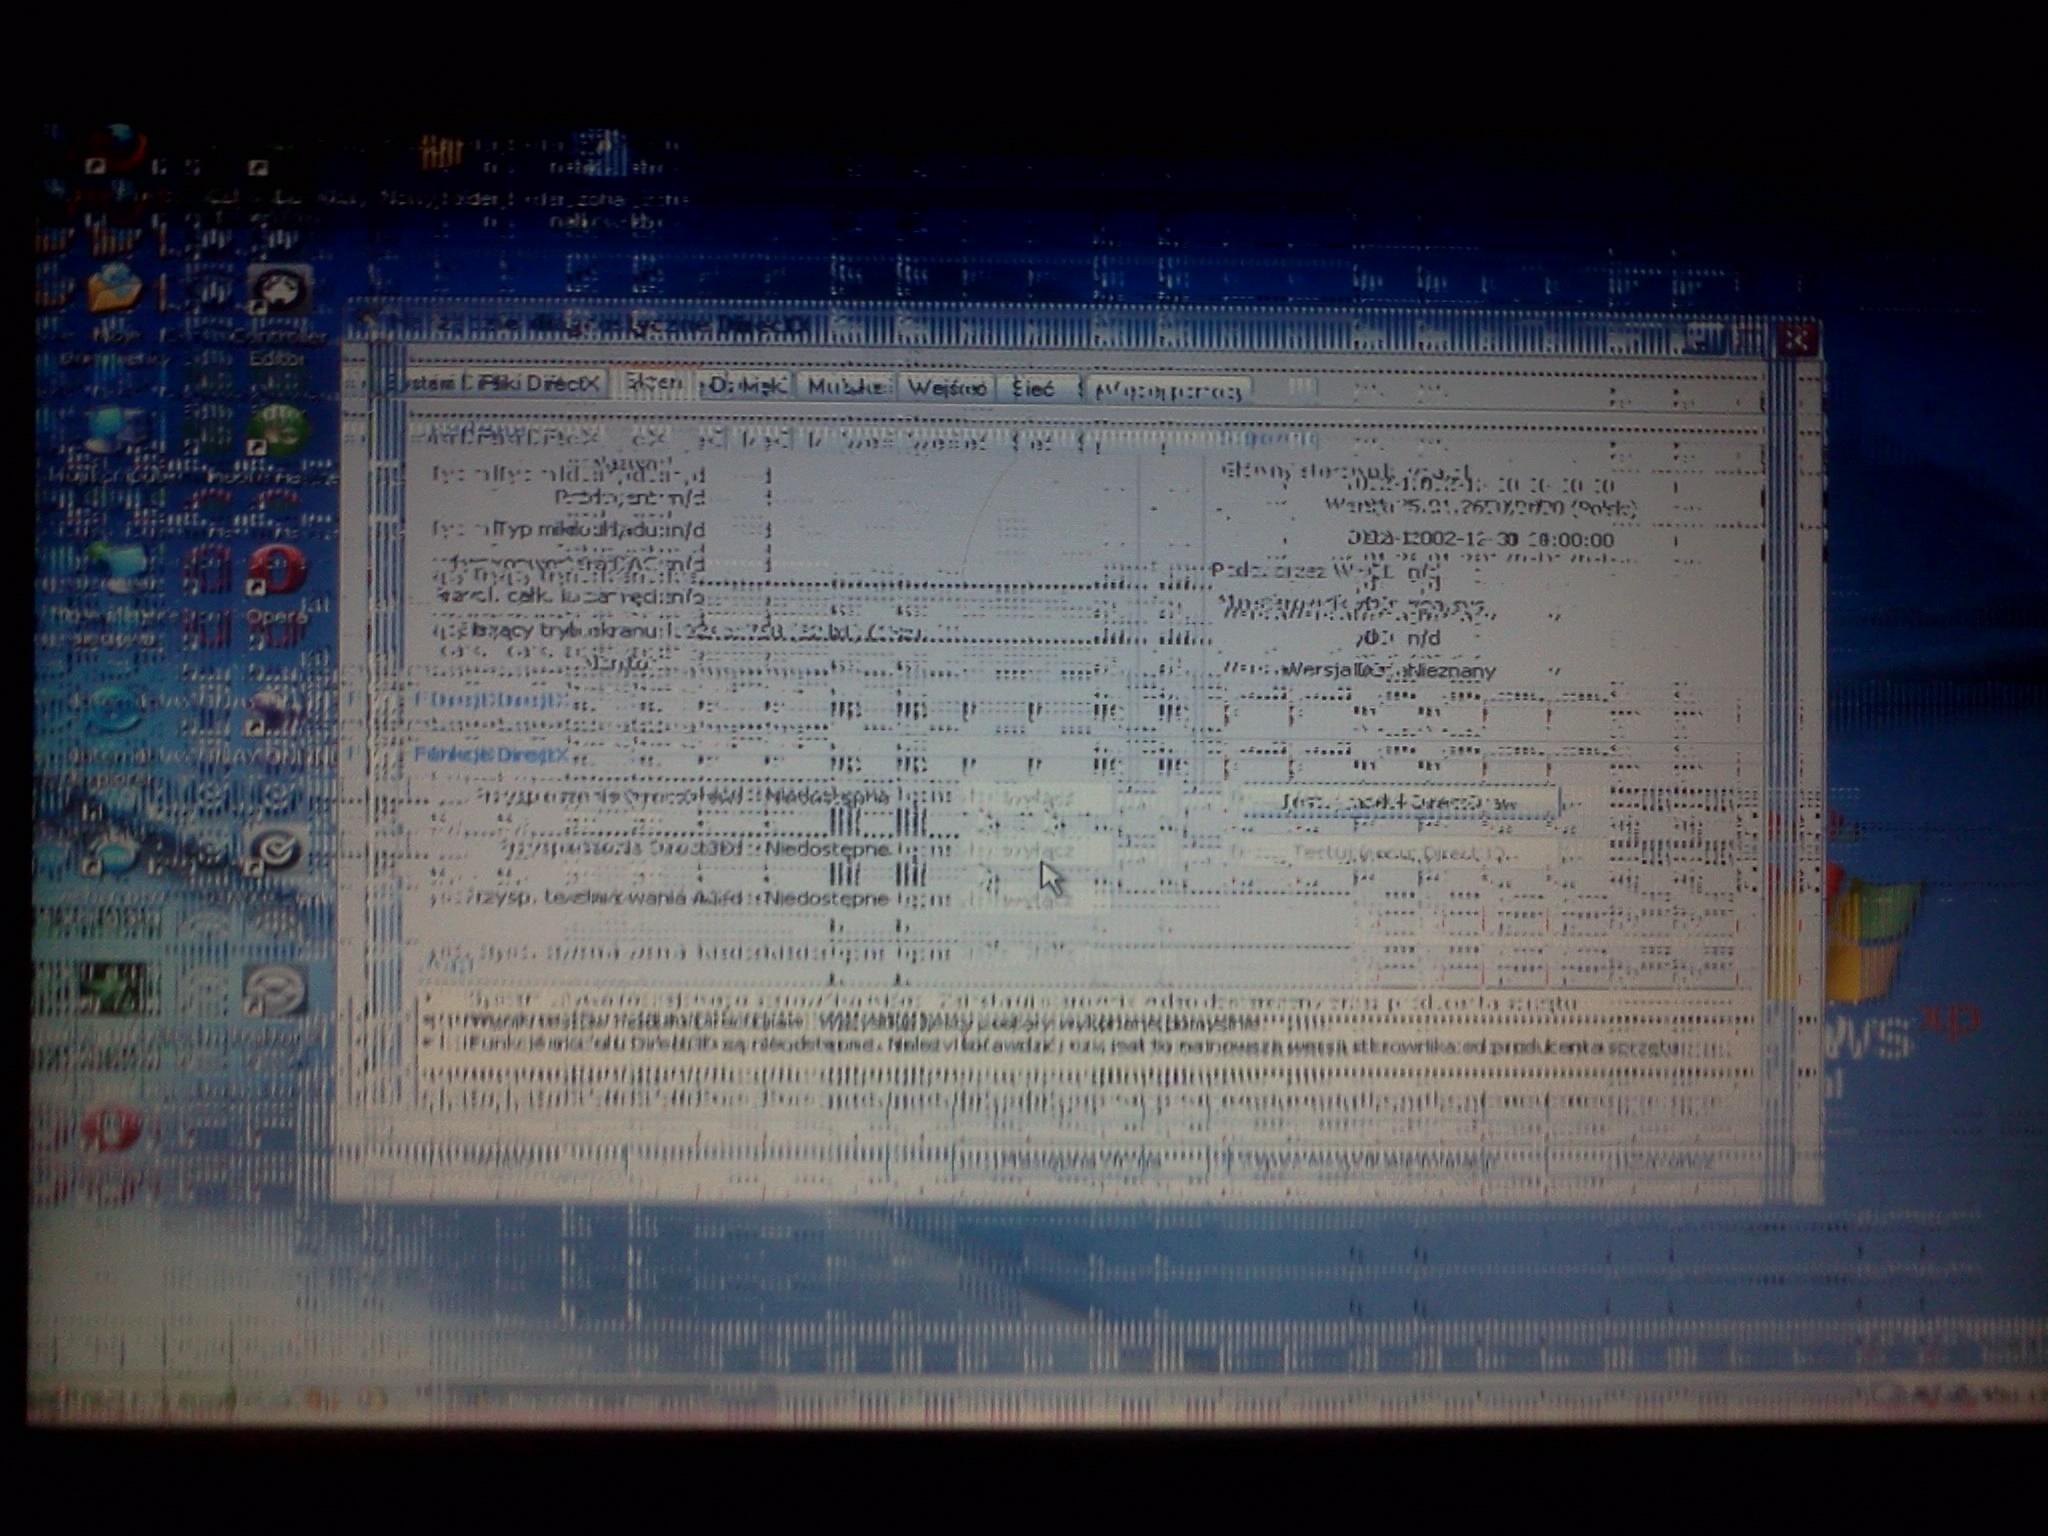 [Sprzedam] P�yta Dell Lattitude d620 - uszk. grafika + Intel C2D 2x1.6 - 30z�